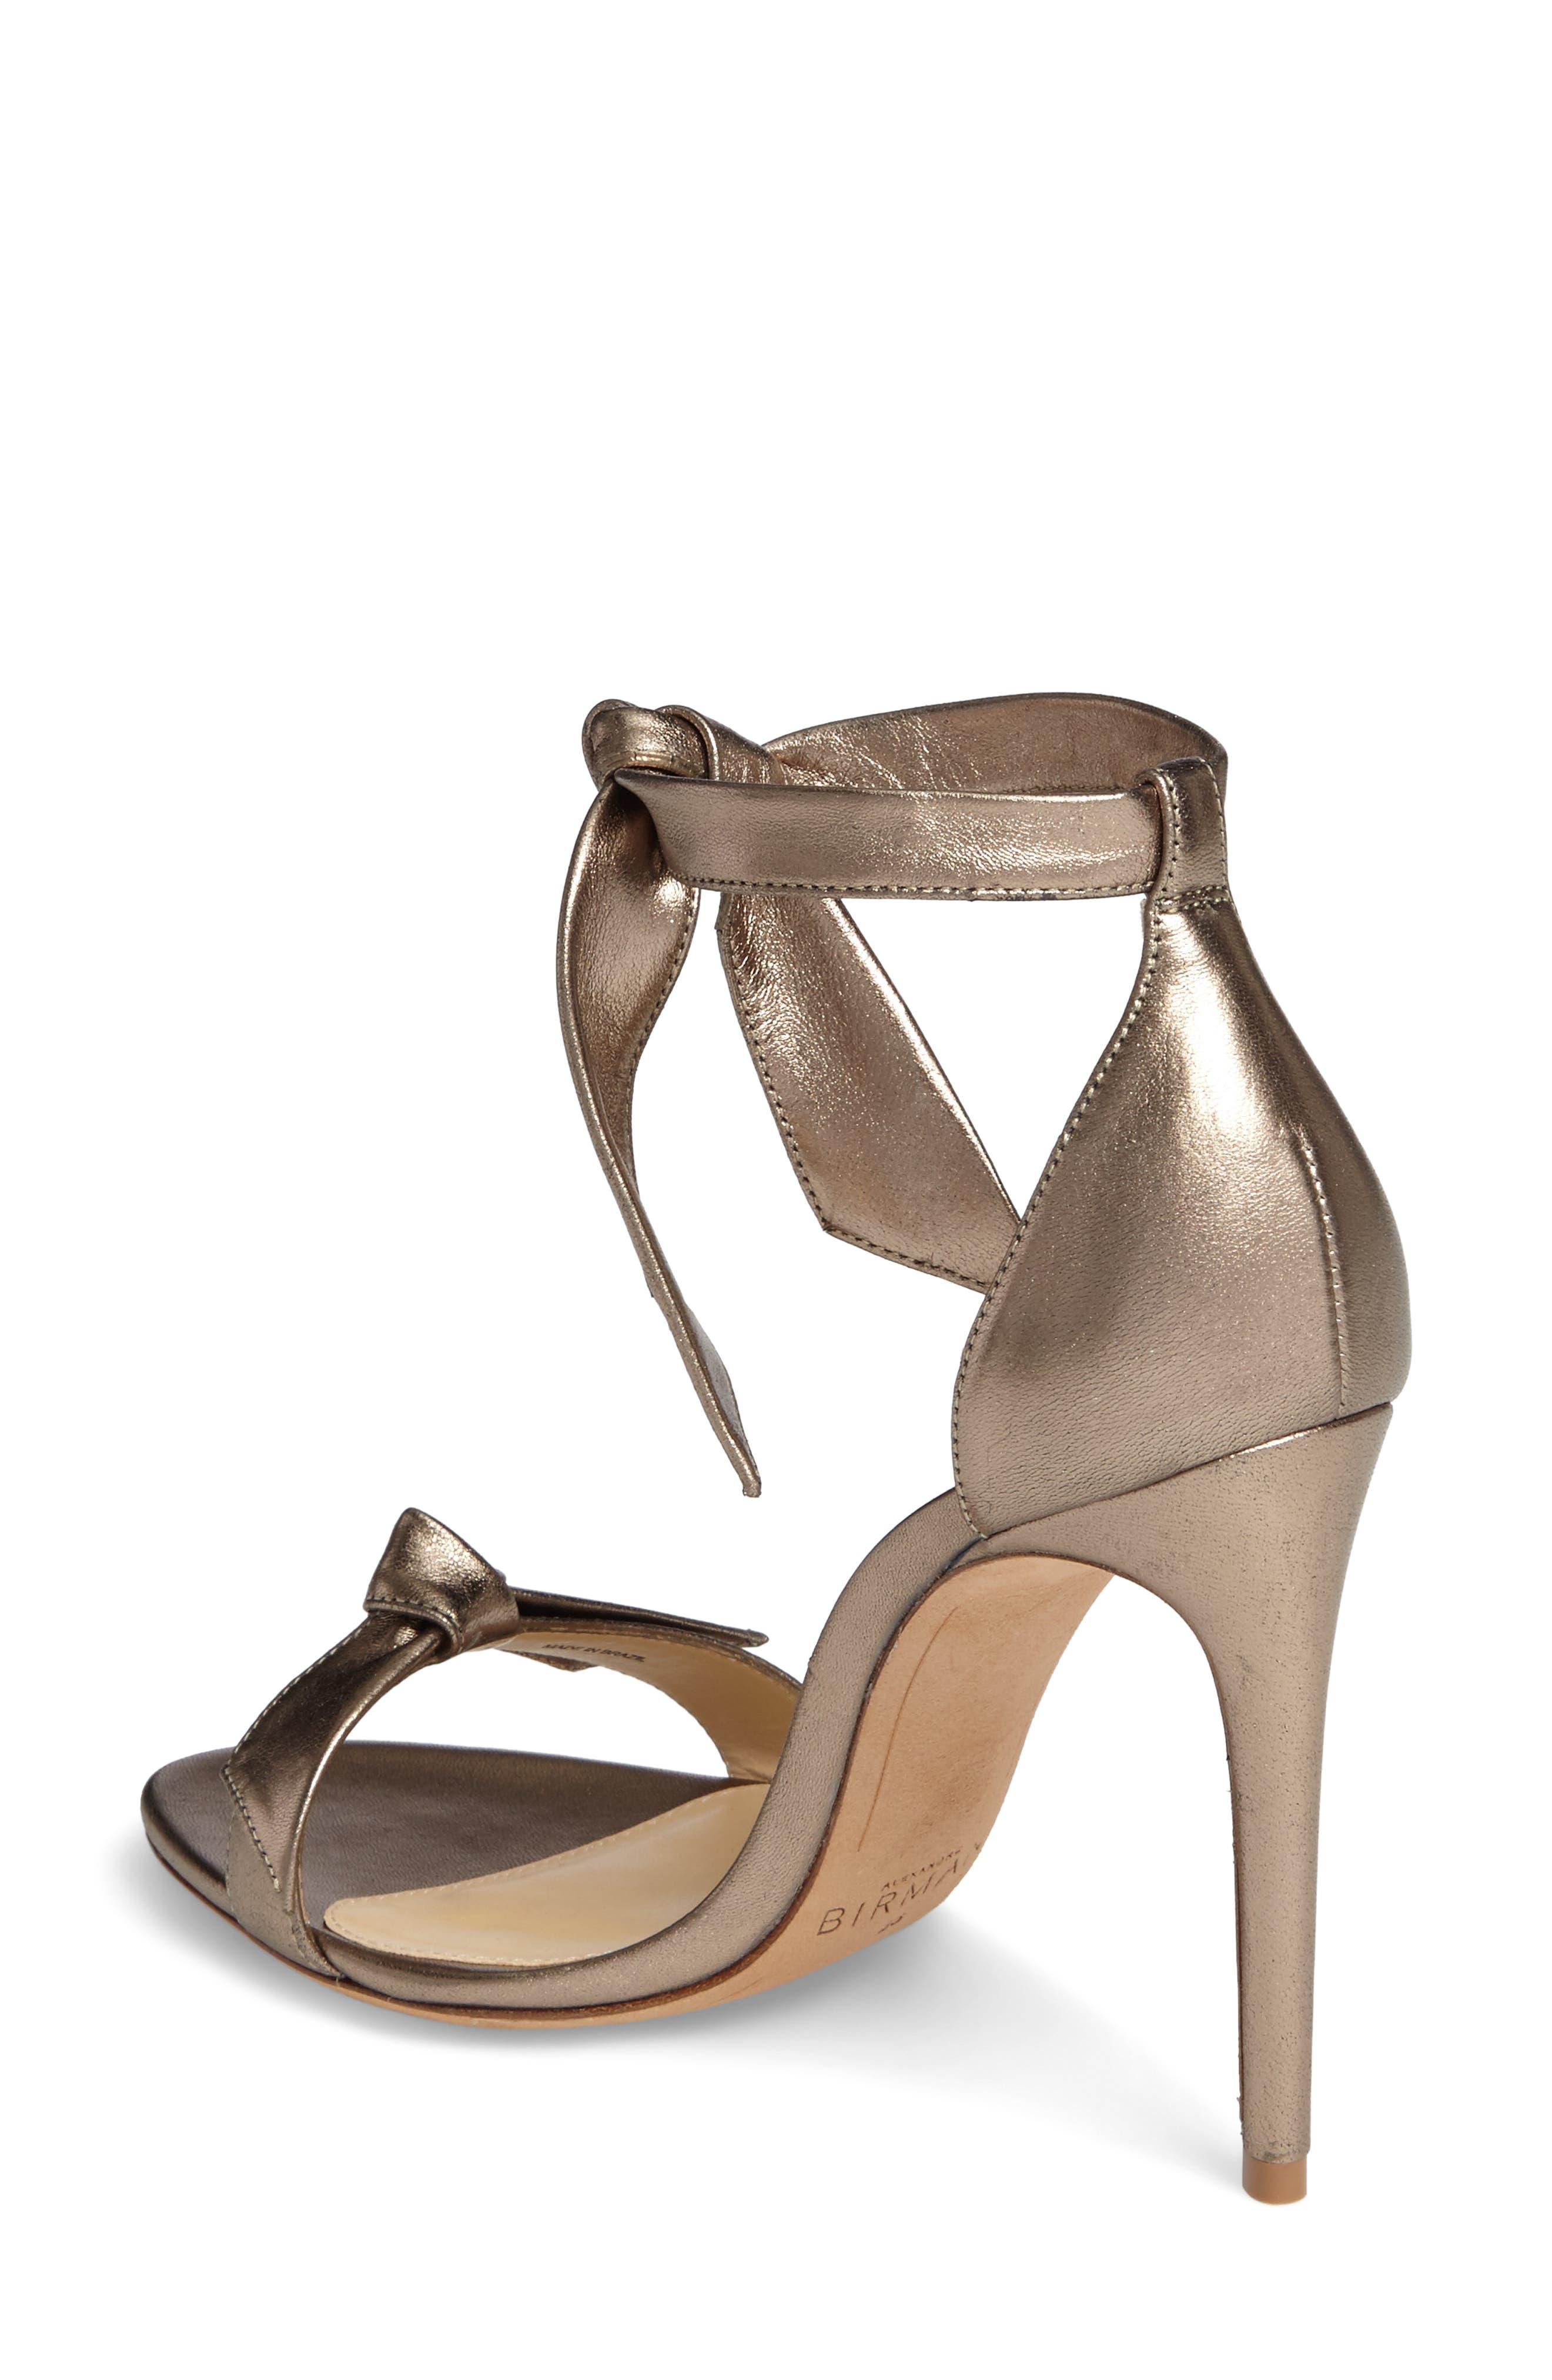 Clarita Ankle Tie Sandal,                             Alternate thumbnail 2, color,                             METALLIC GOLD LEATHER